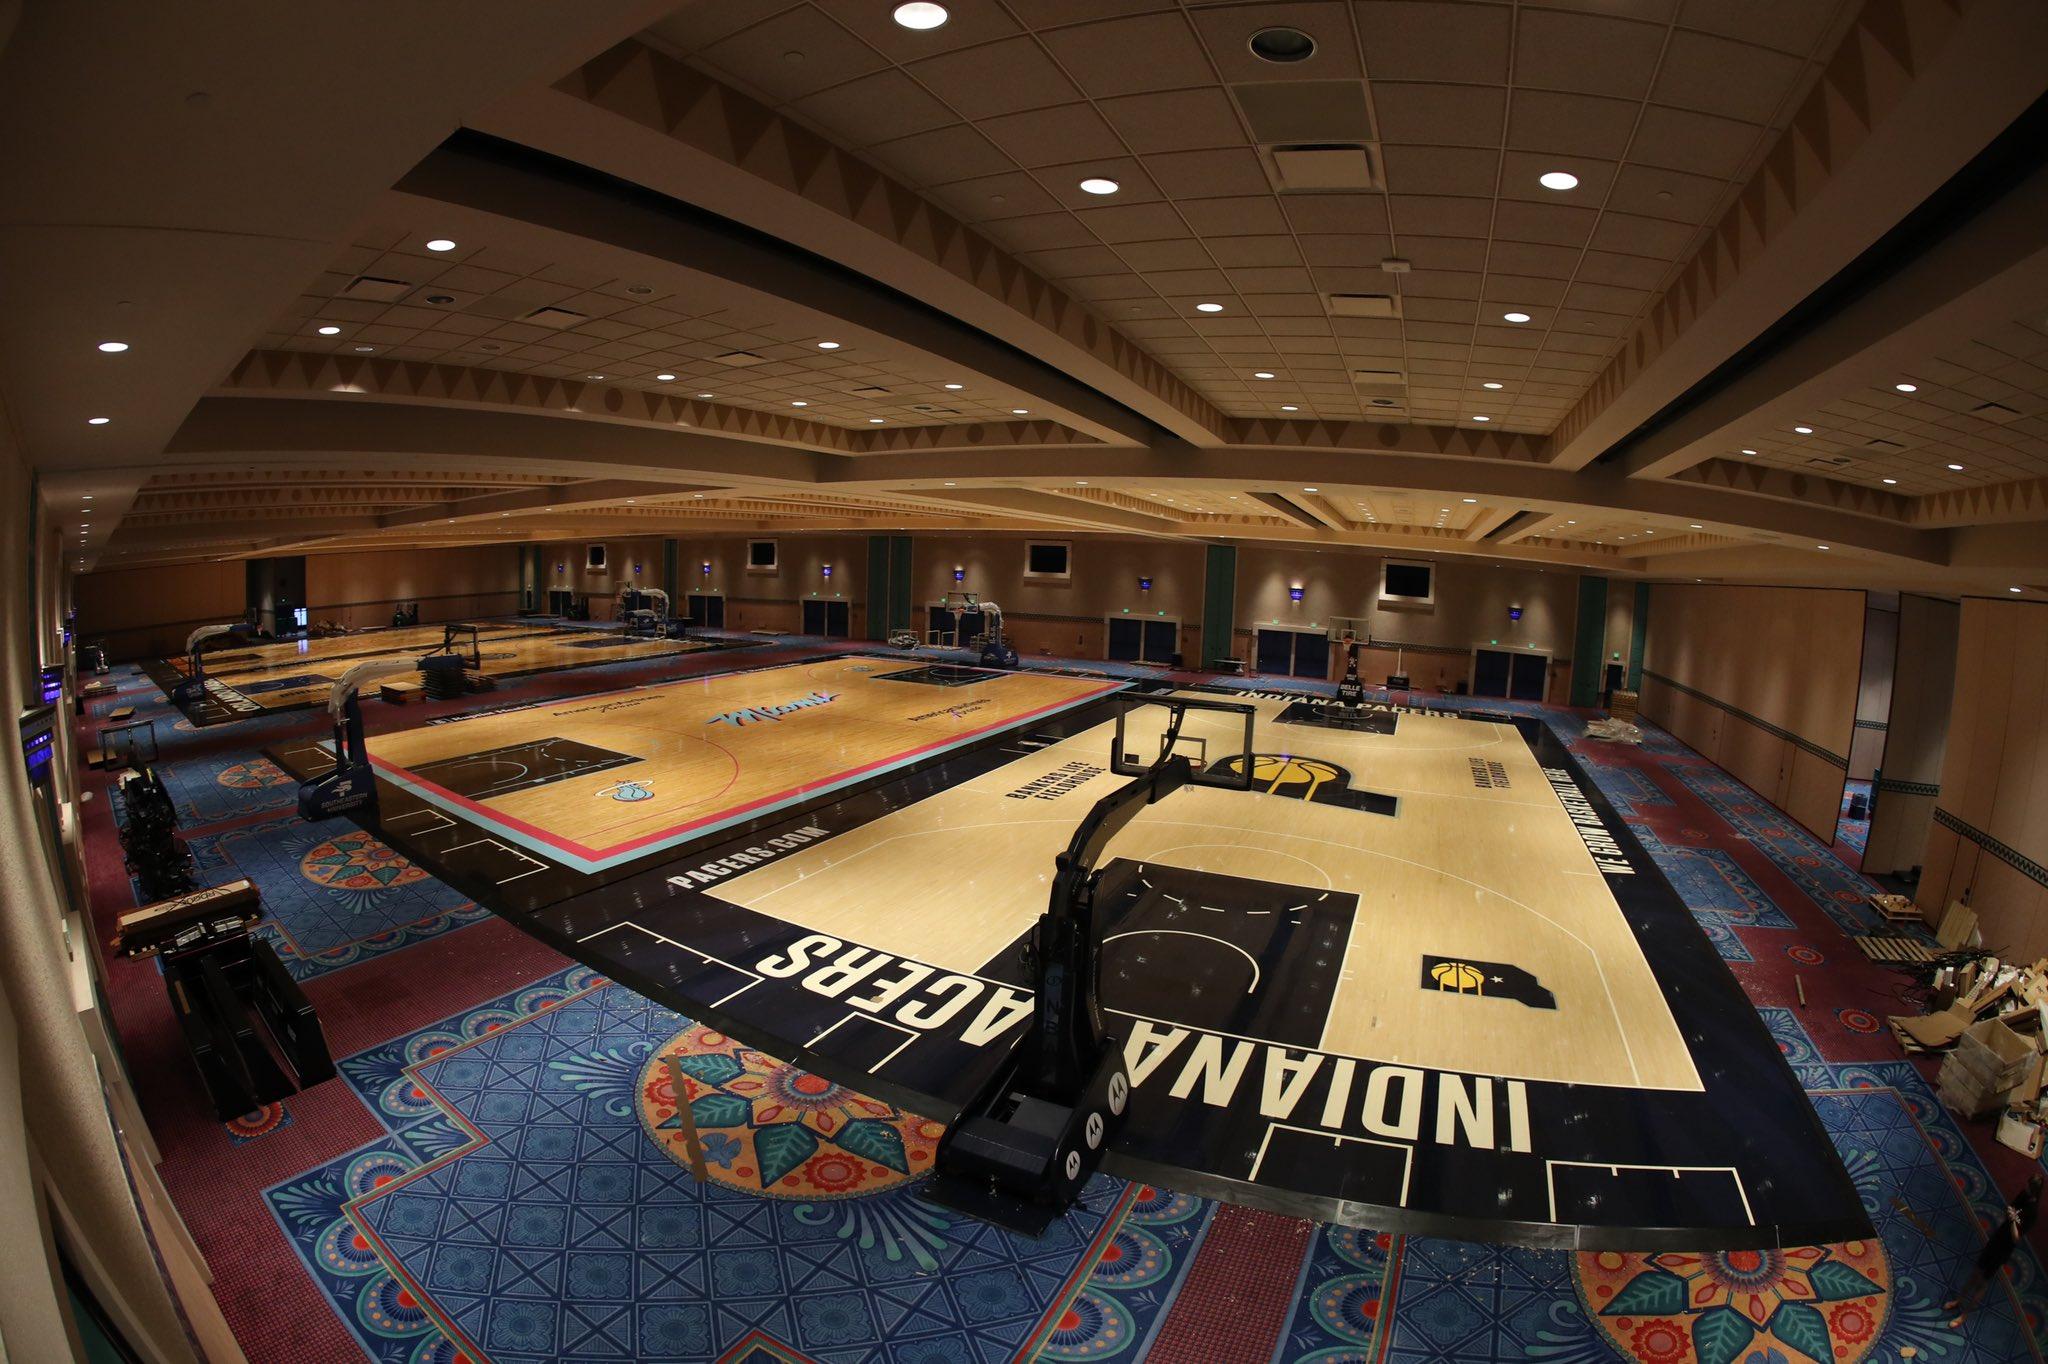 NBA官方推特发布迪士尼世界建设完工的球队训练场图片